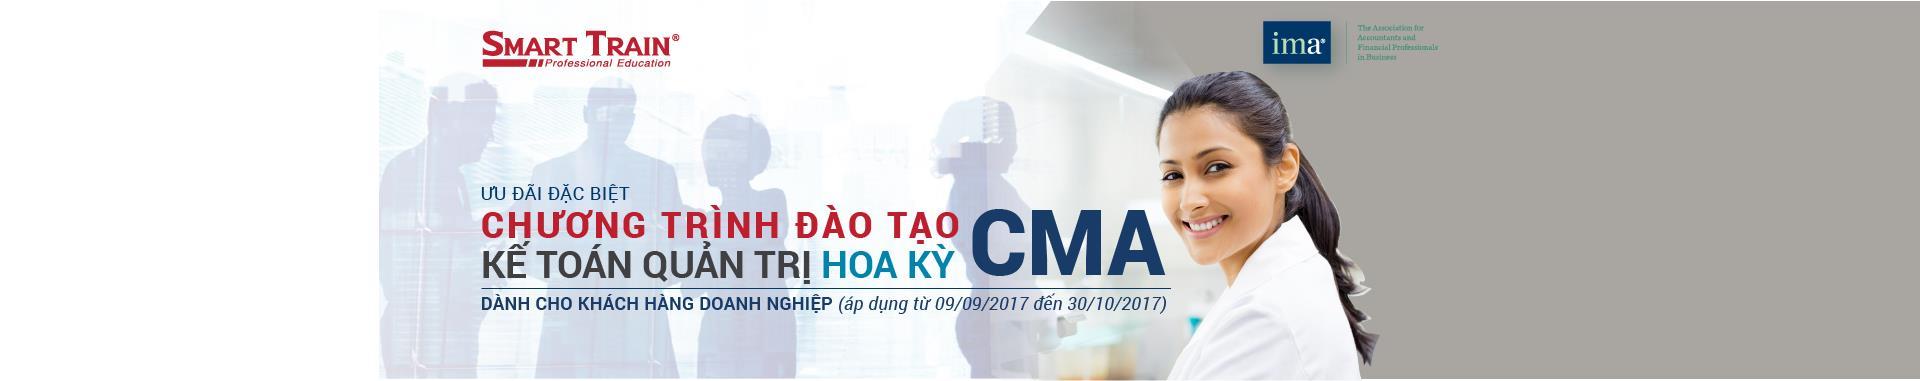 CMADN_Banner_chính